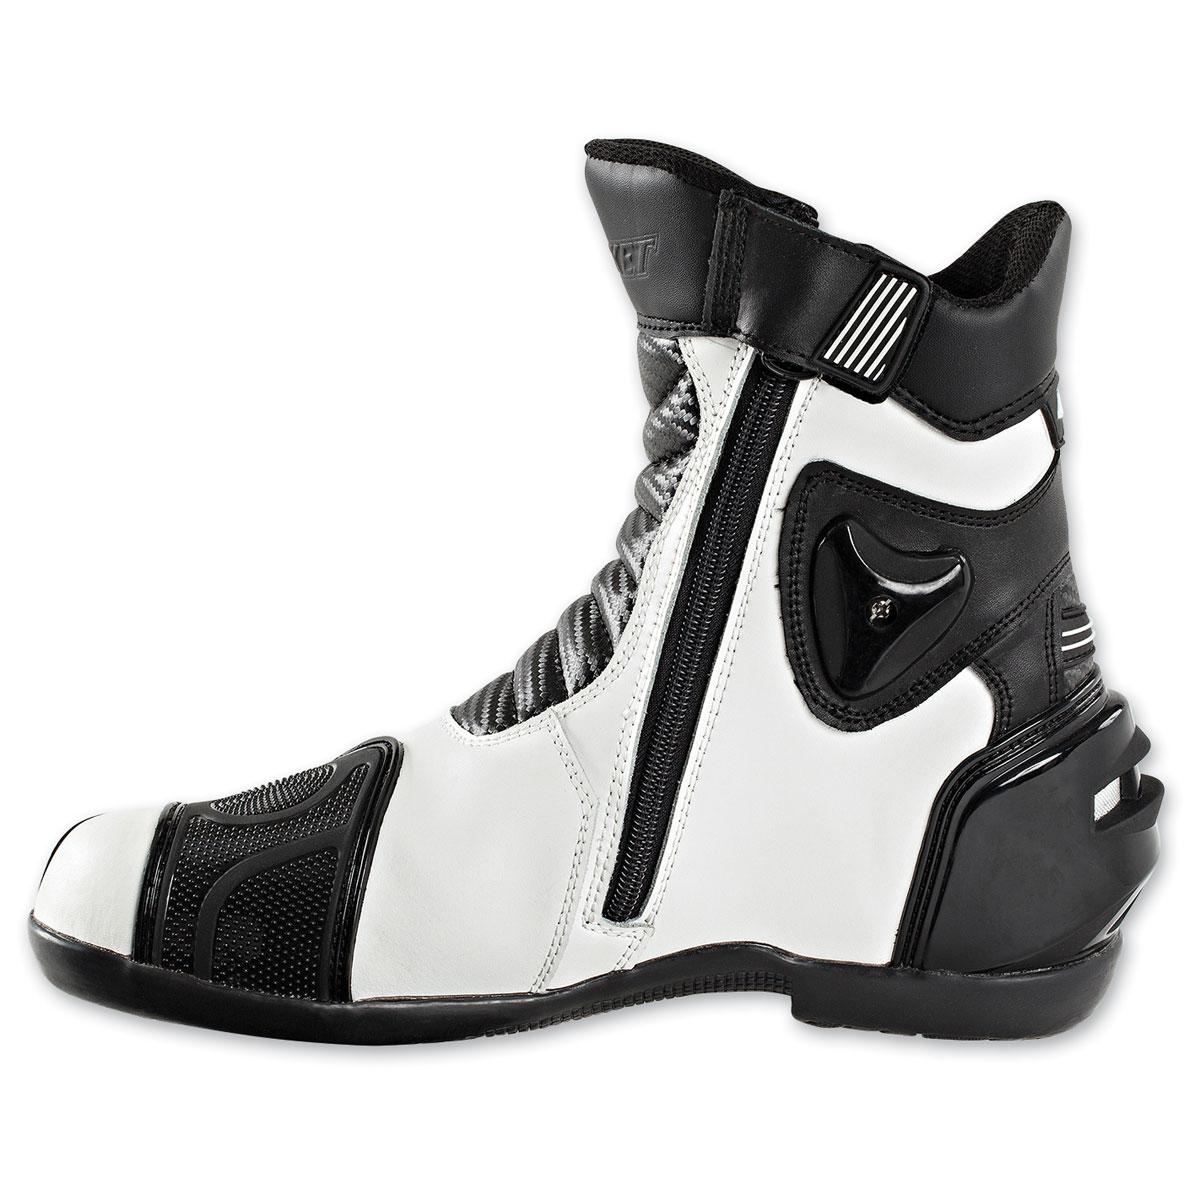 Joe Rocket Men's Super Street White Boots